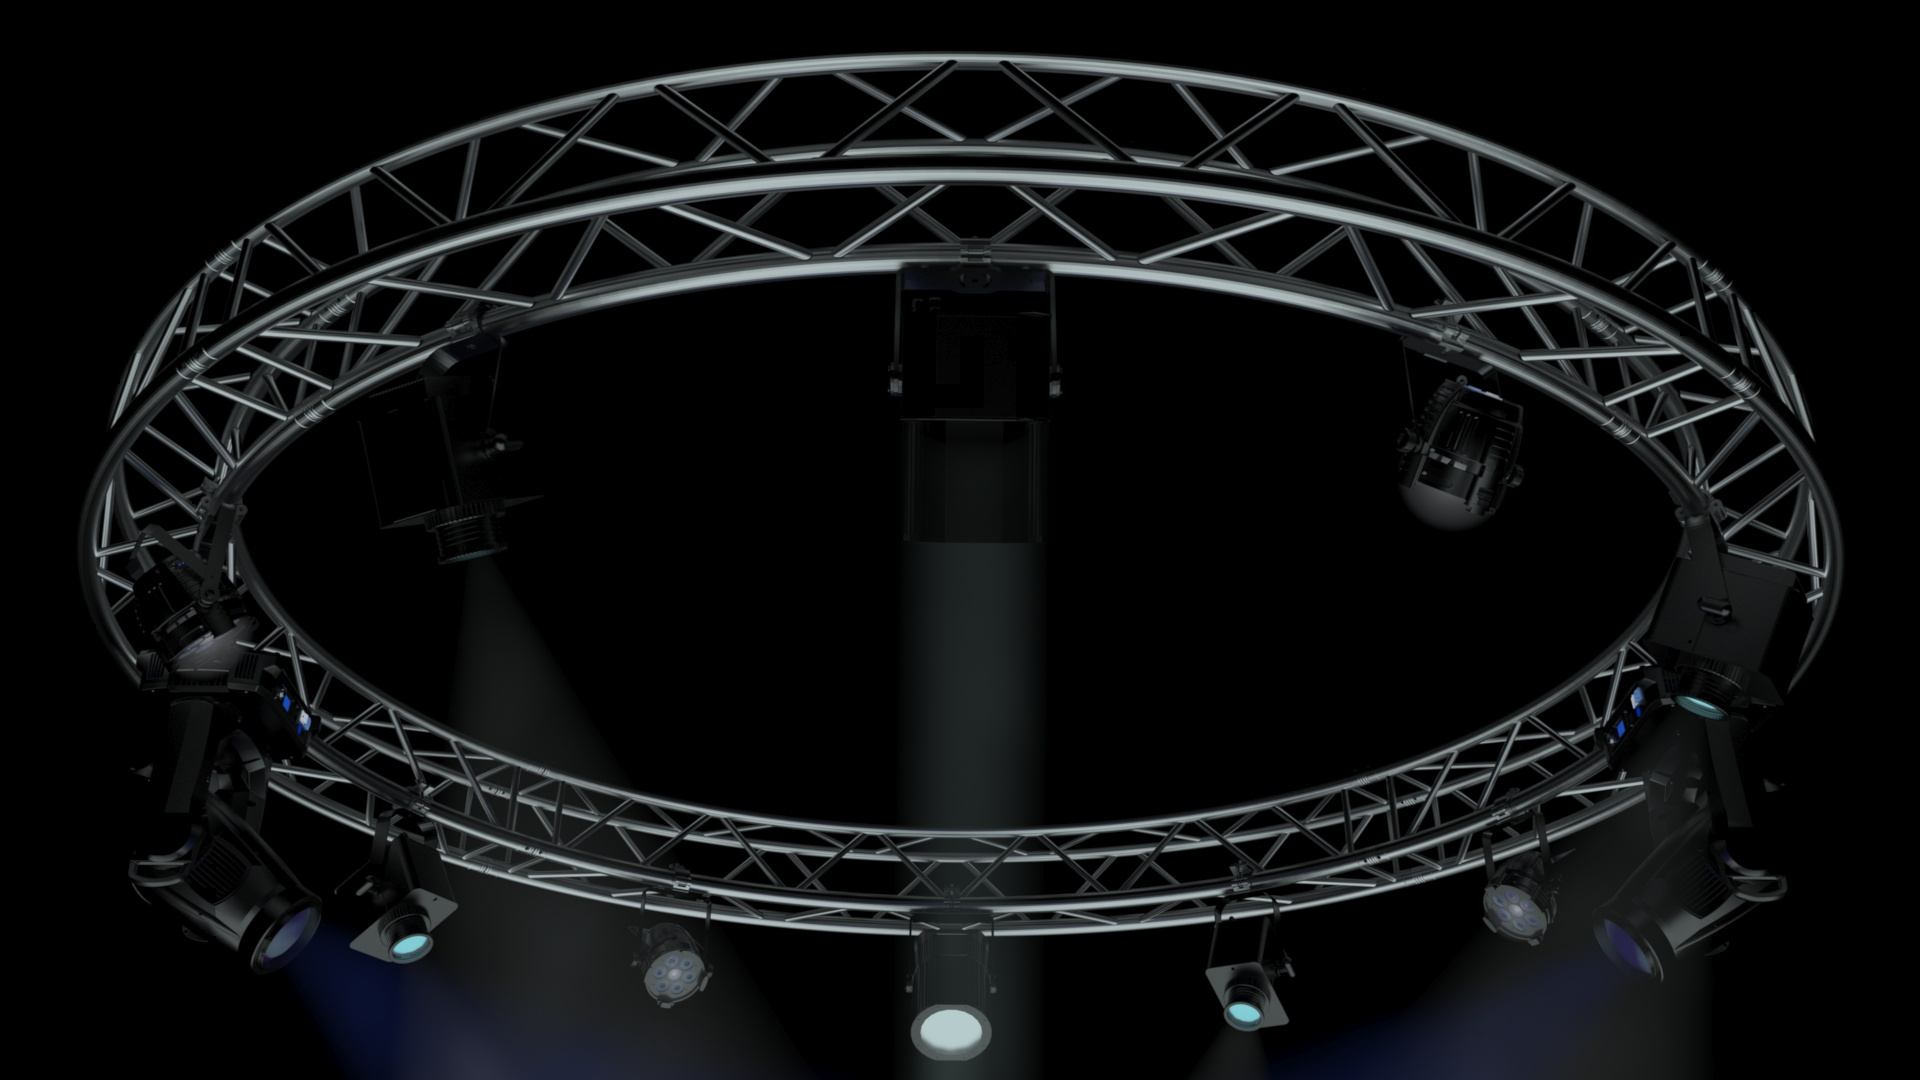 41-05-CircleSquareTruss400cm-StageLights